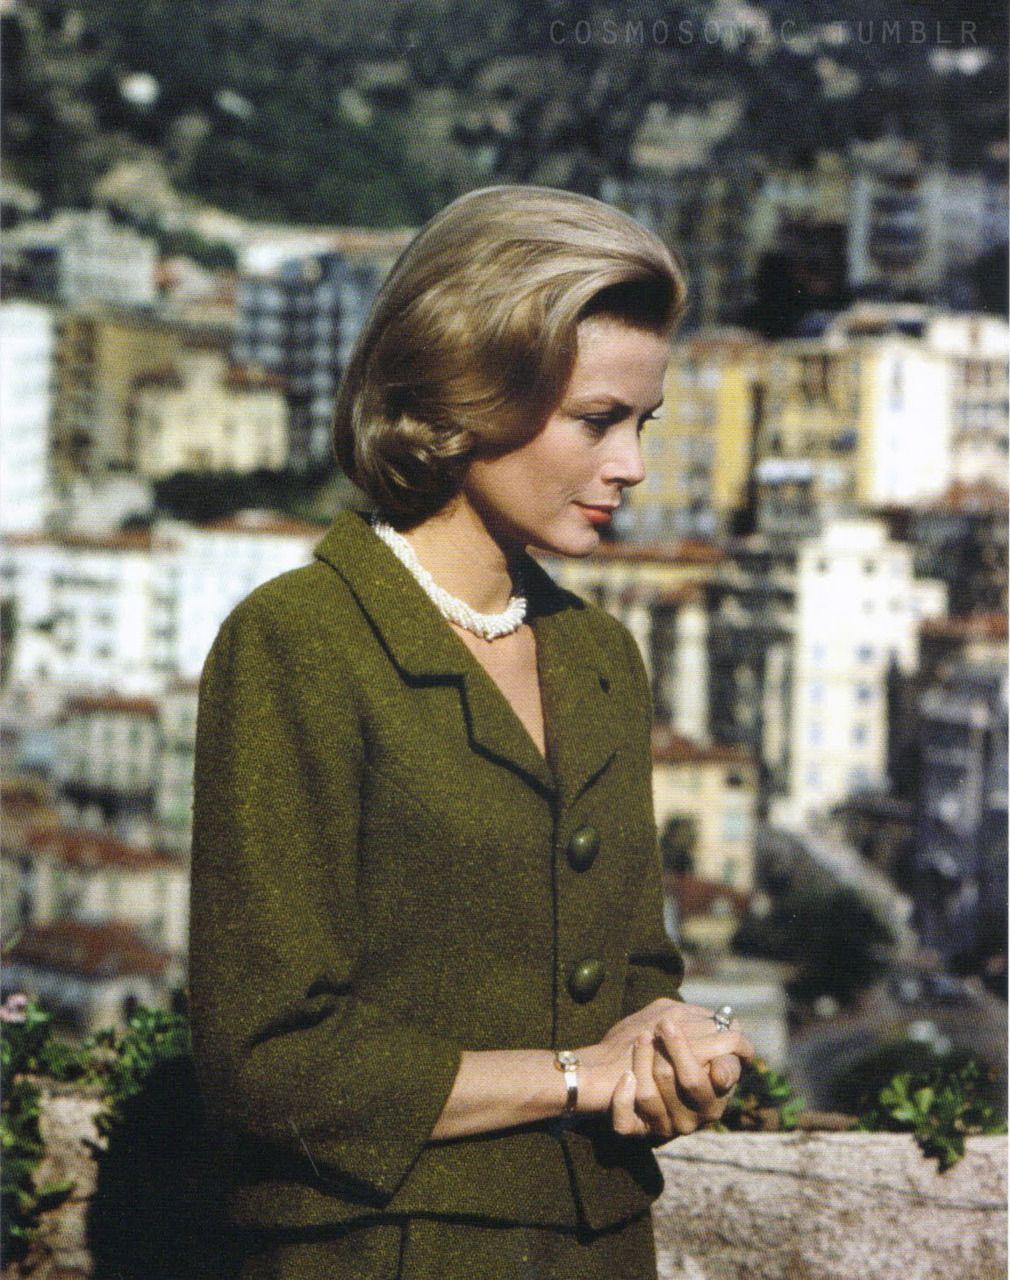 Grace in Balenciaga - the suit belongs to Princess Caroline now...